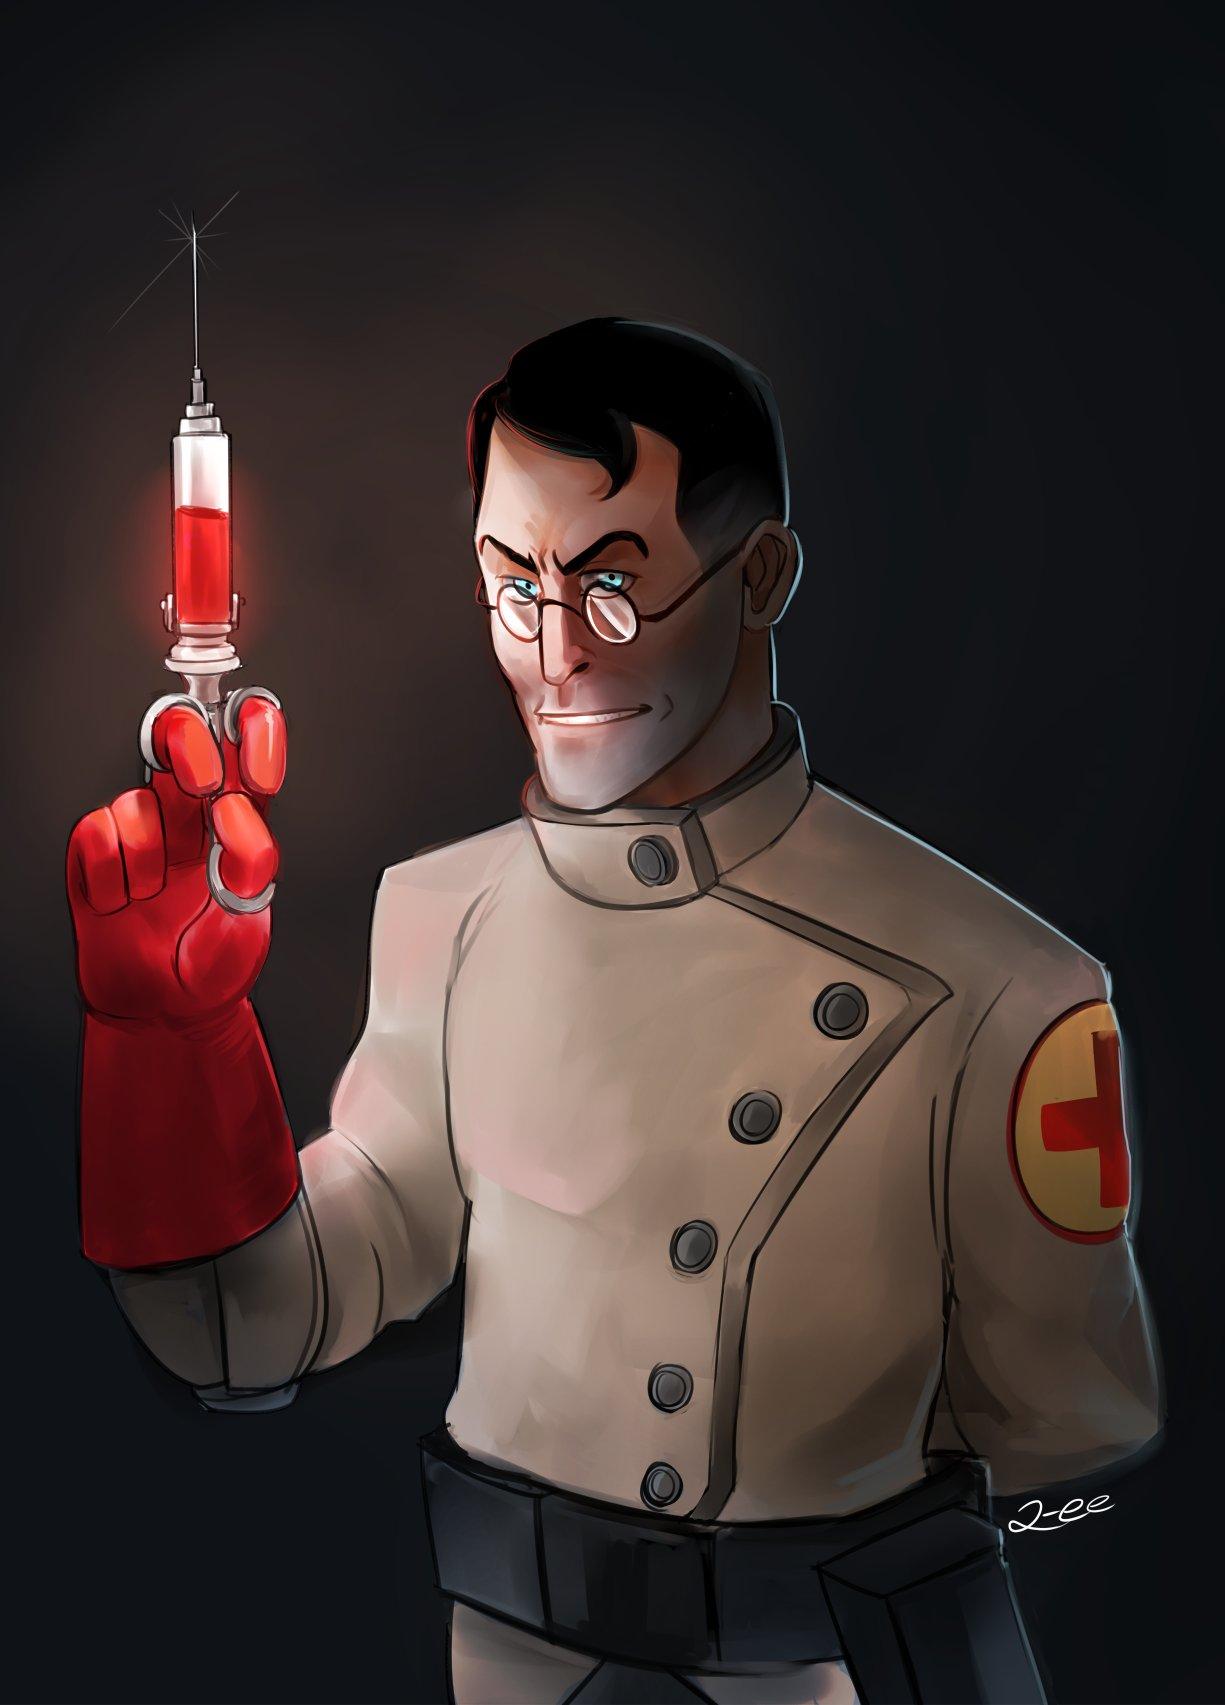 Karen north a medic